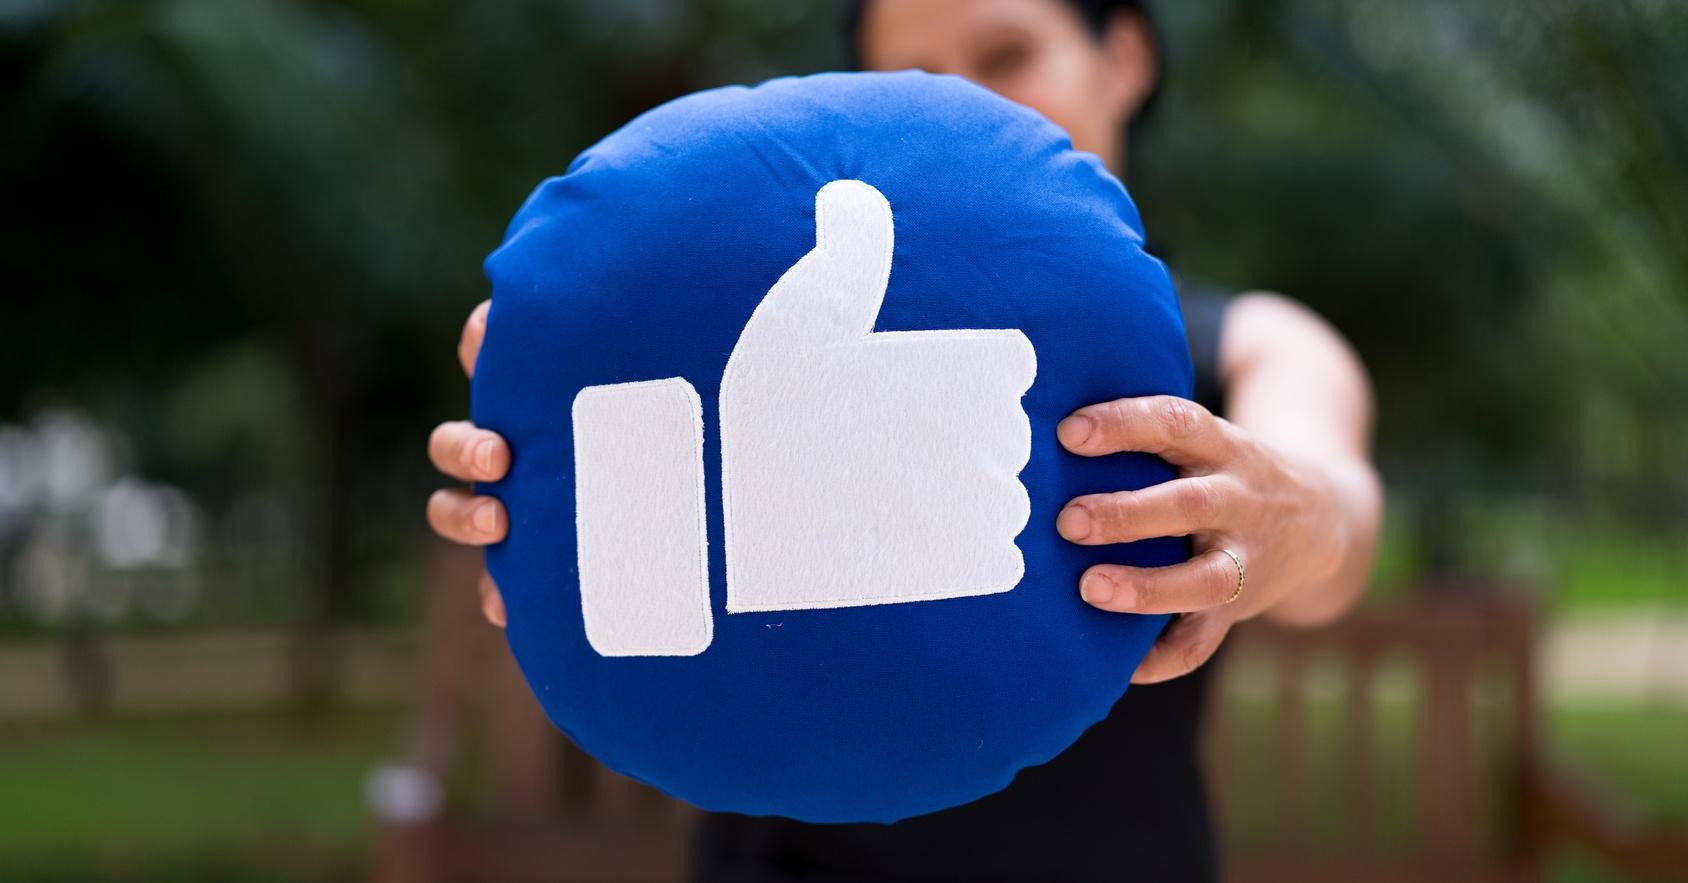 facebook-dislike-button- Cropped (1)